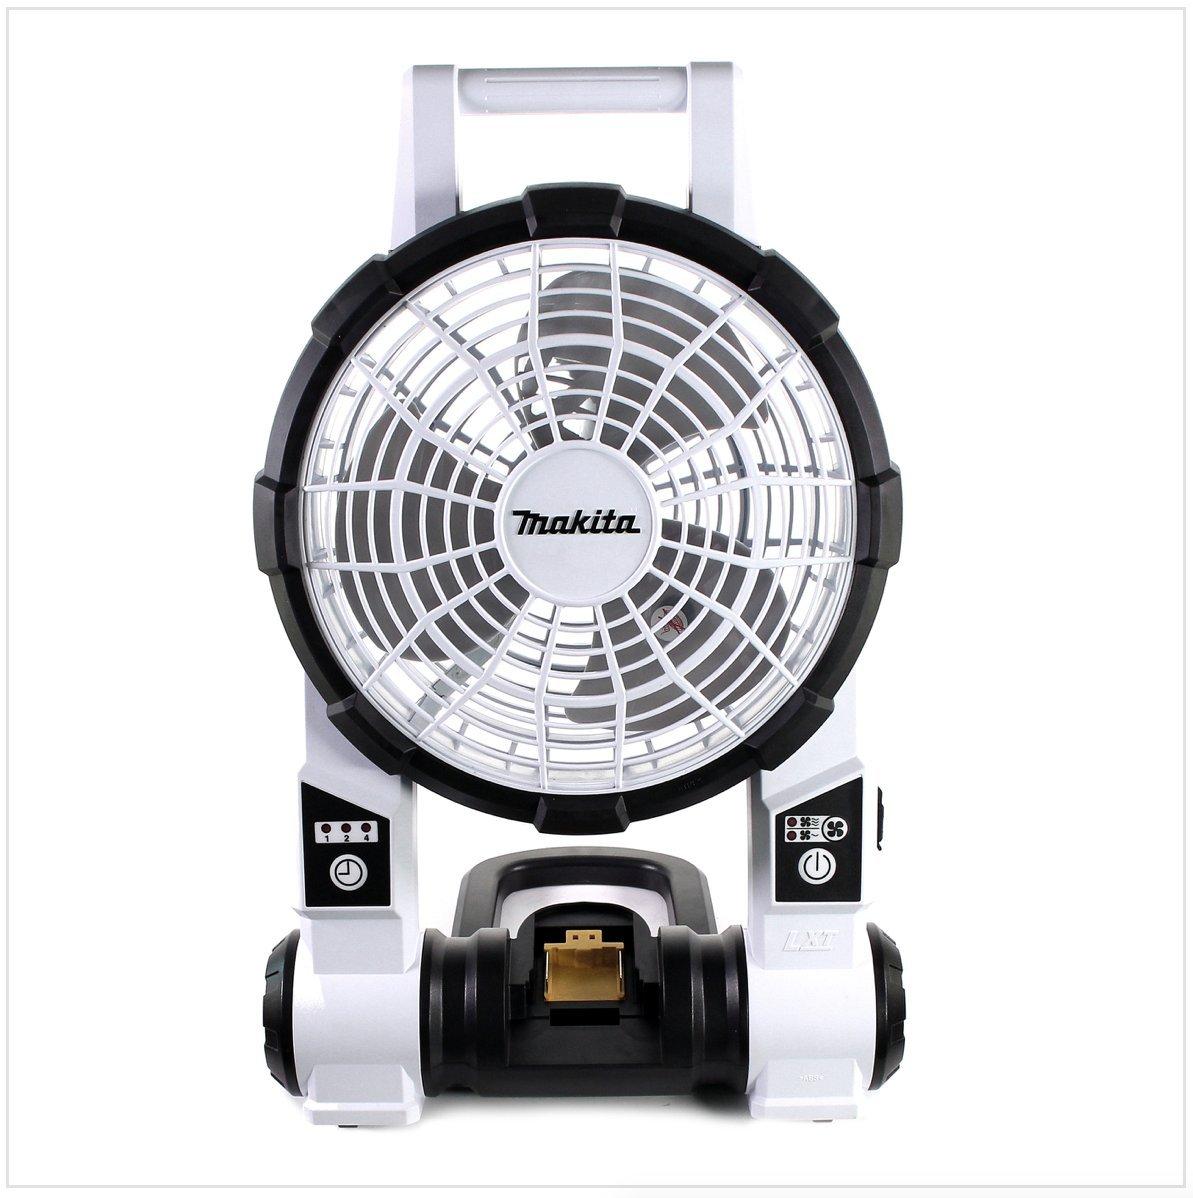 wei/ß 14,4/V Makita dcf201zw tragbar Fan